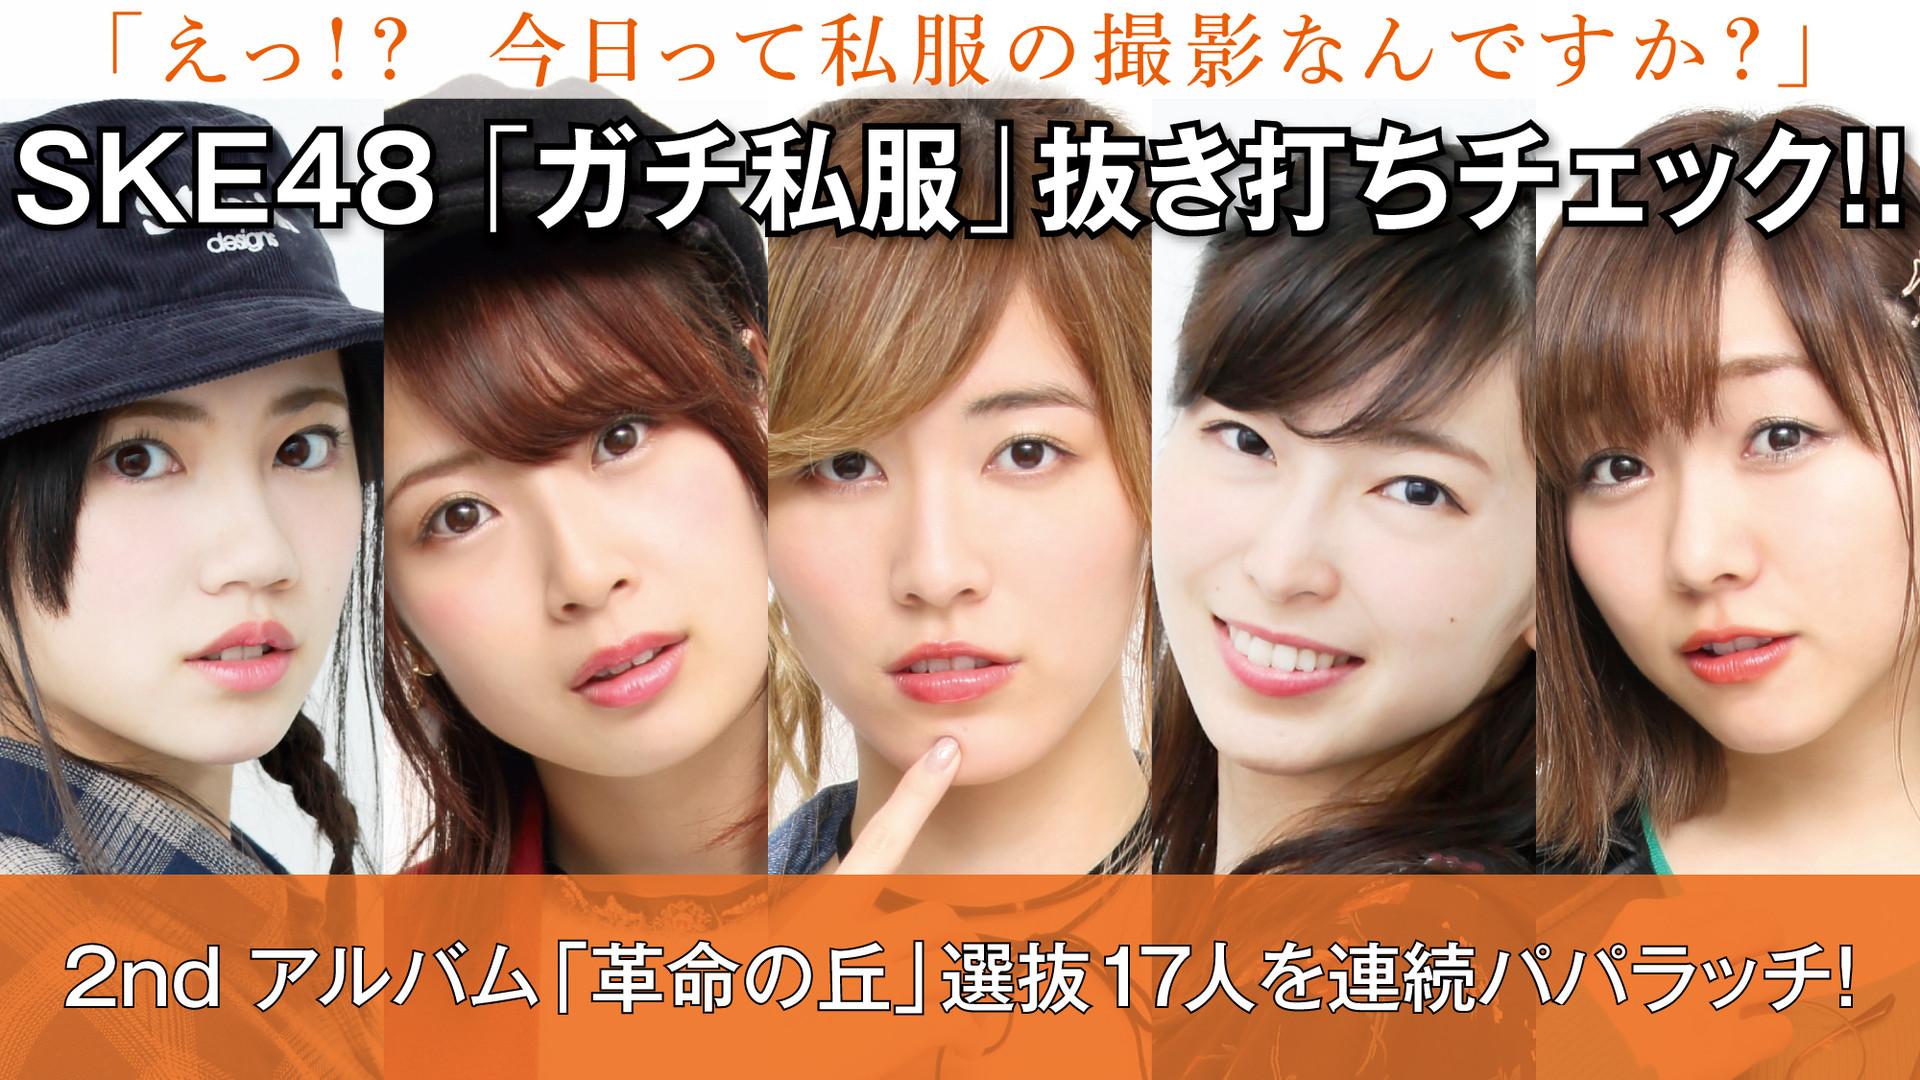 SKE48の画像 p1_24